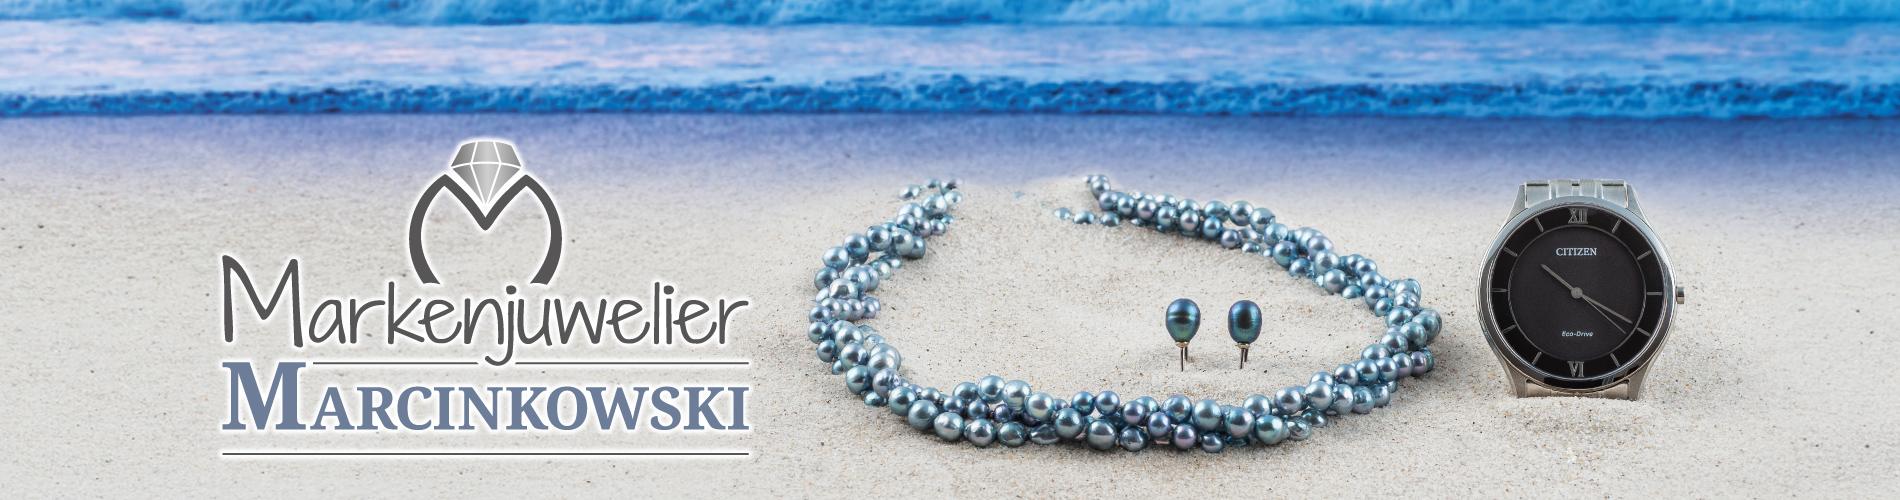 Juwelier Marcinkowski